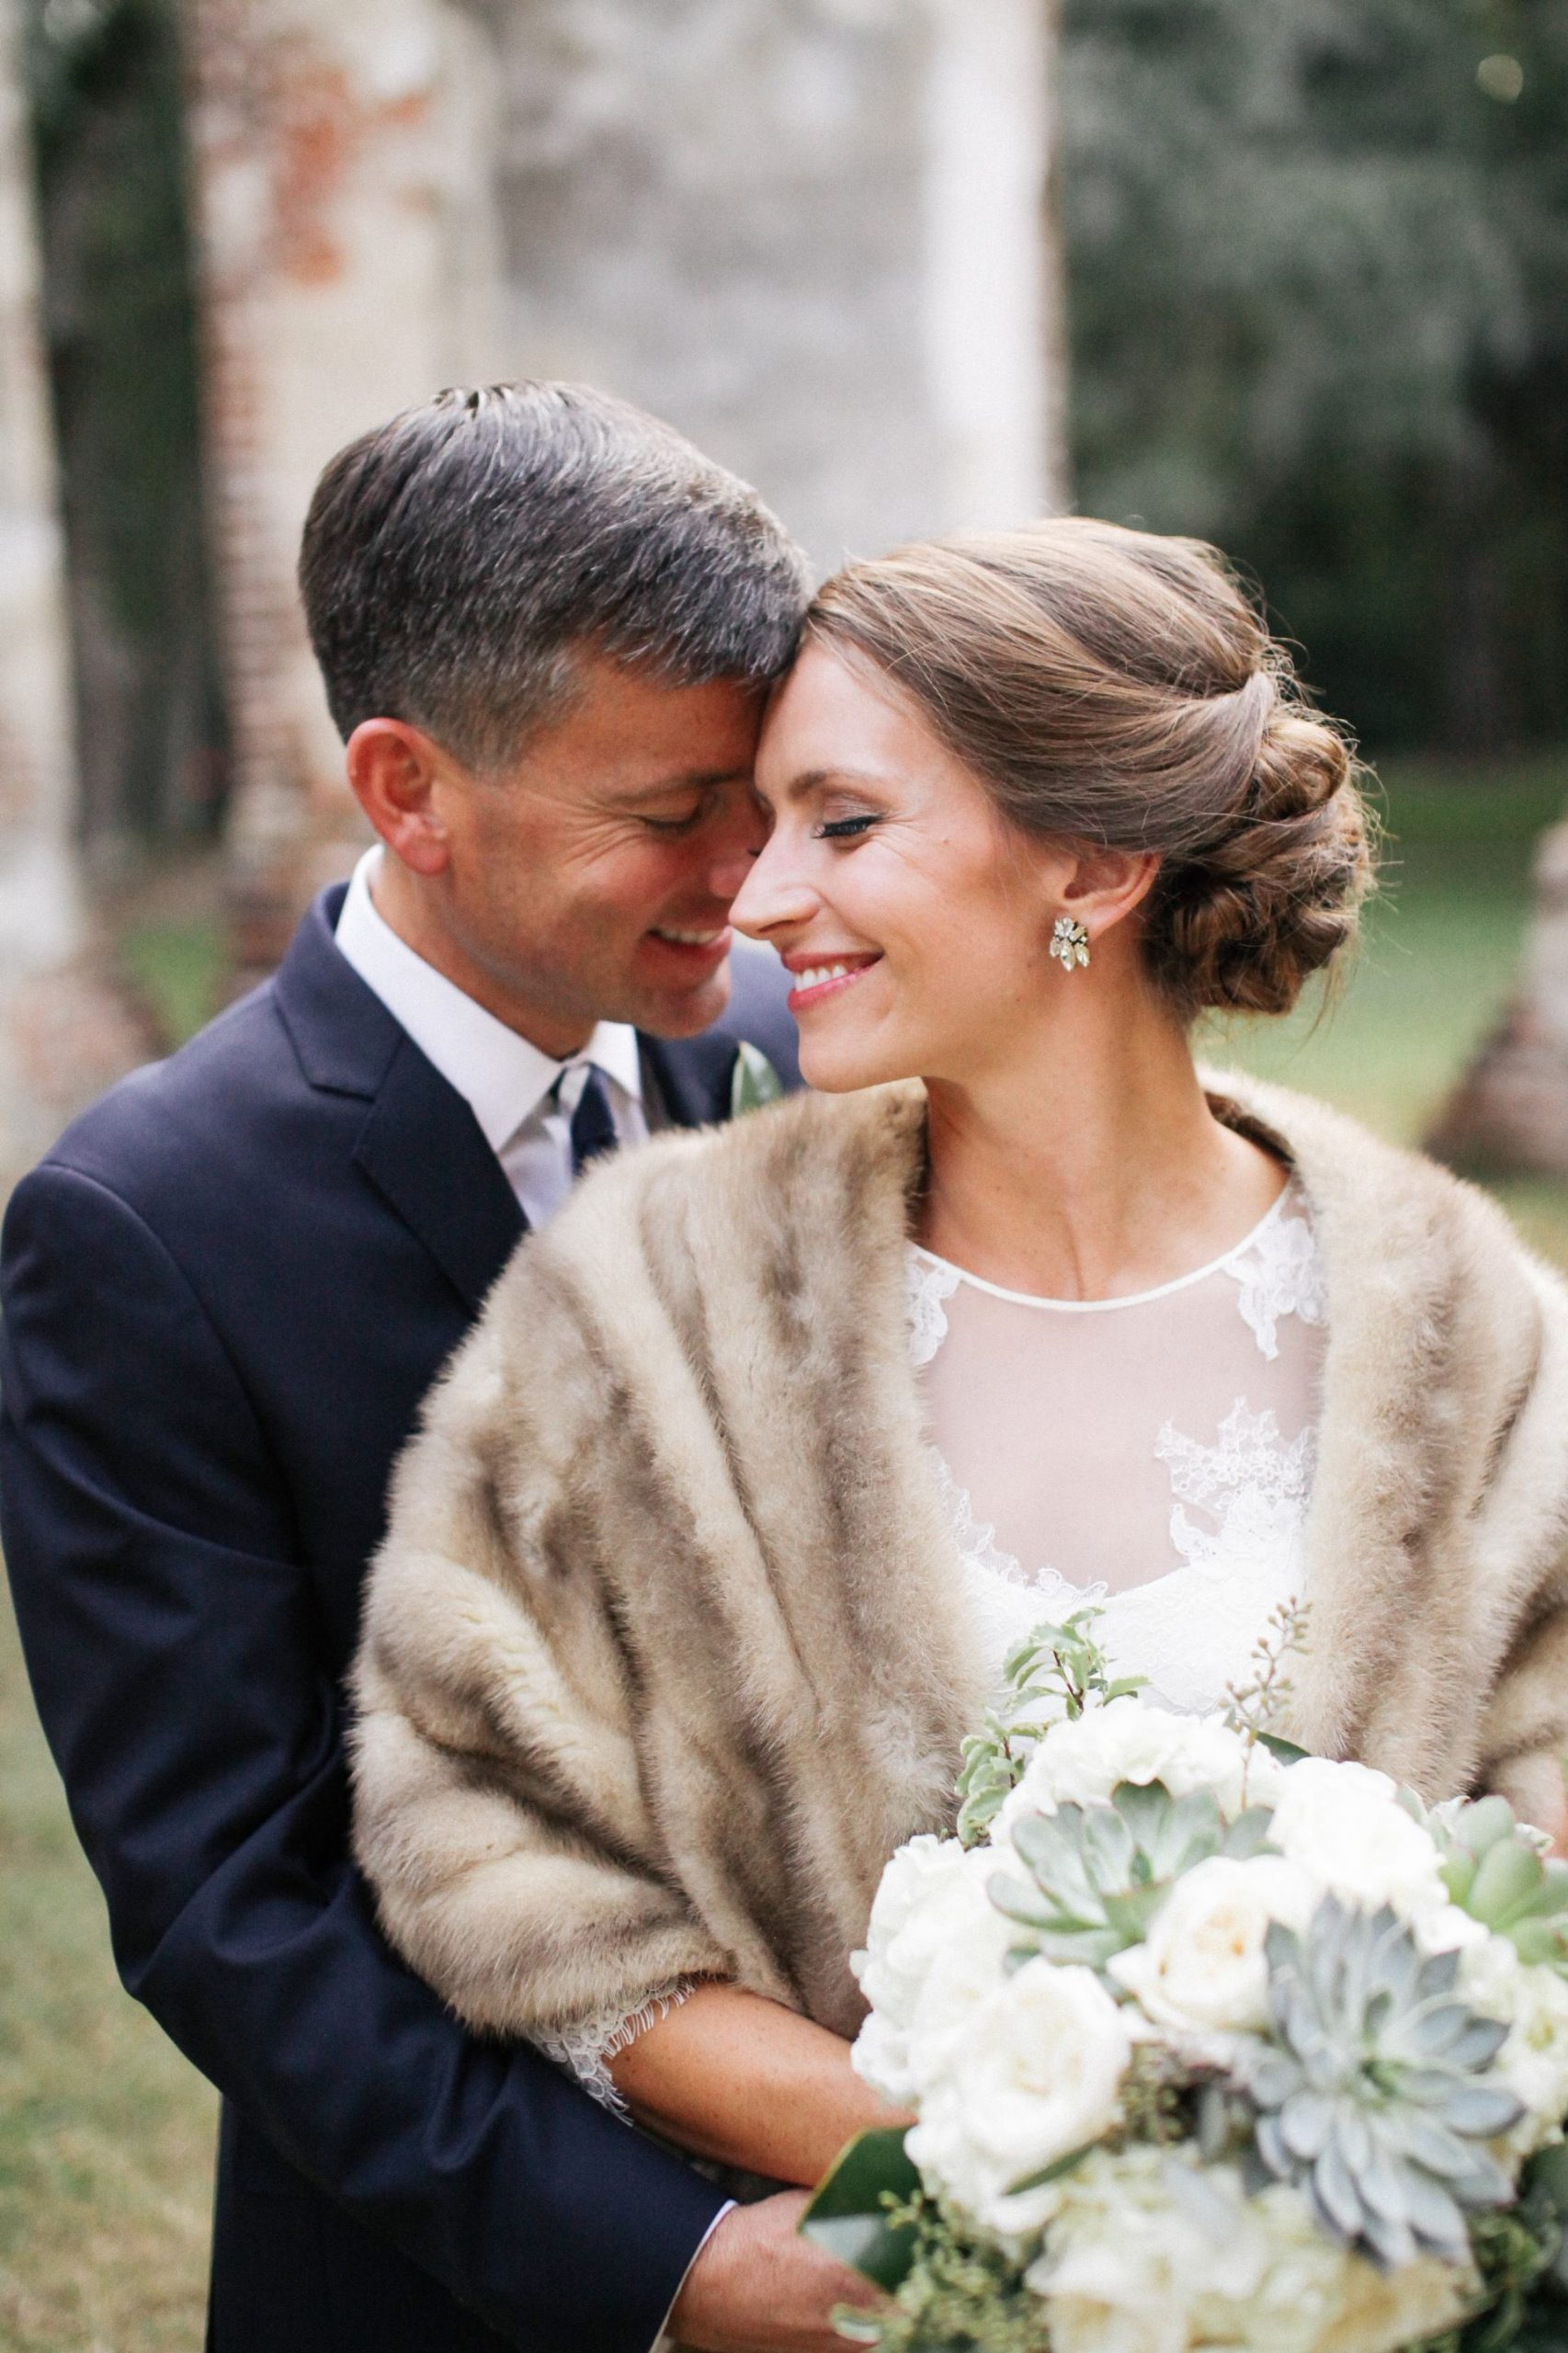 wedding photos fur stole